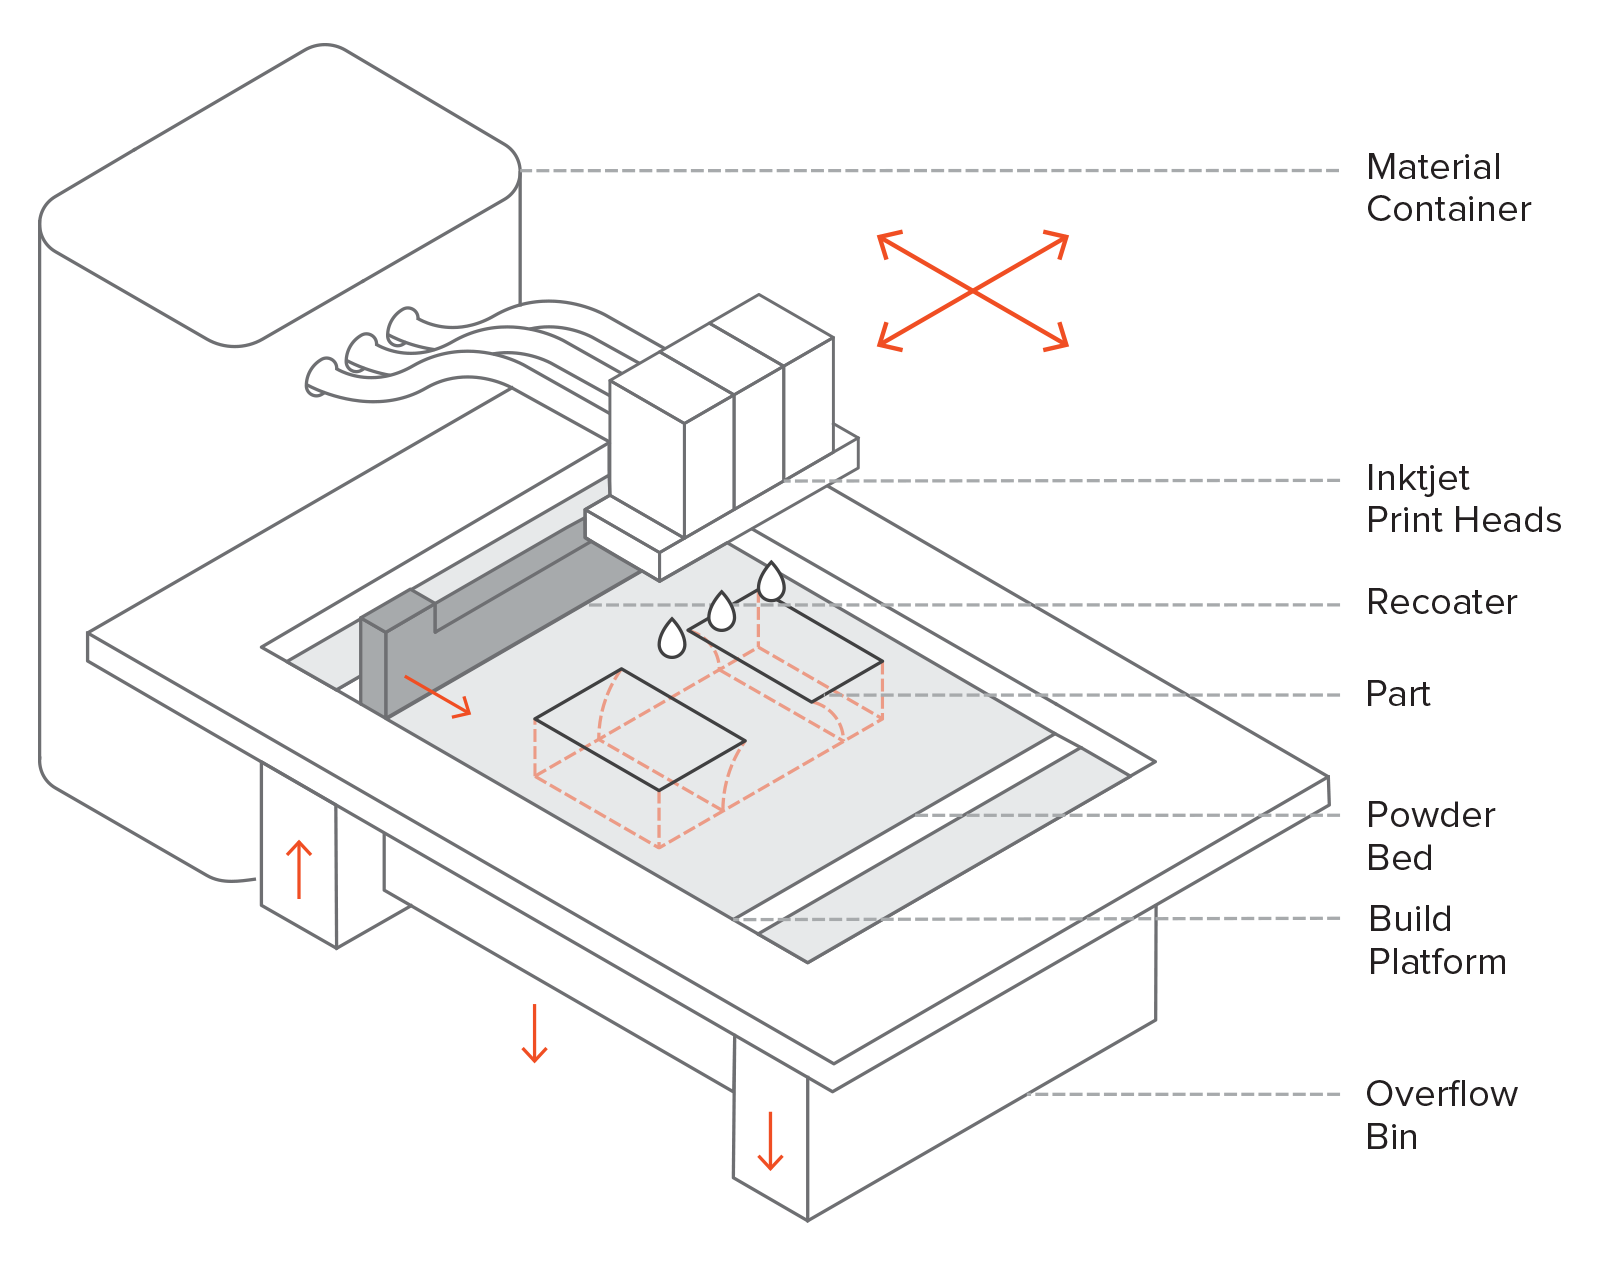 Binder Jetting 3D Printer    Image Source